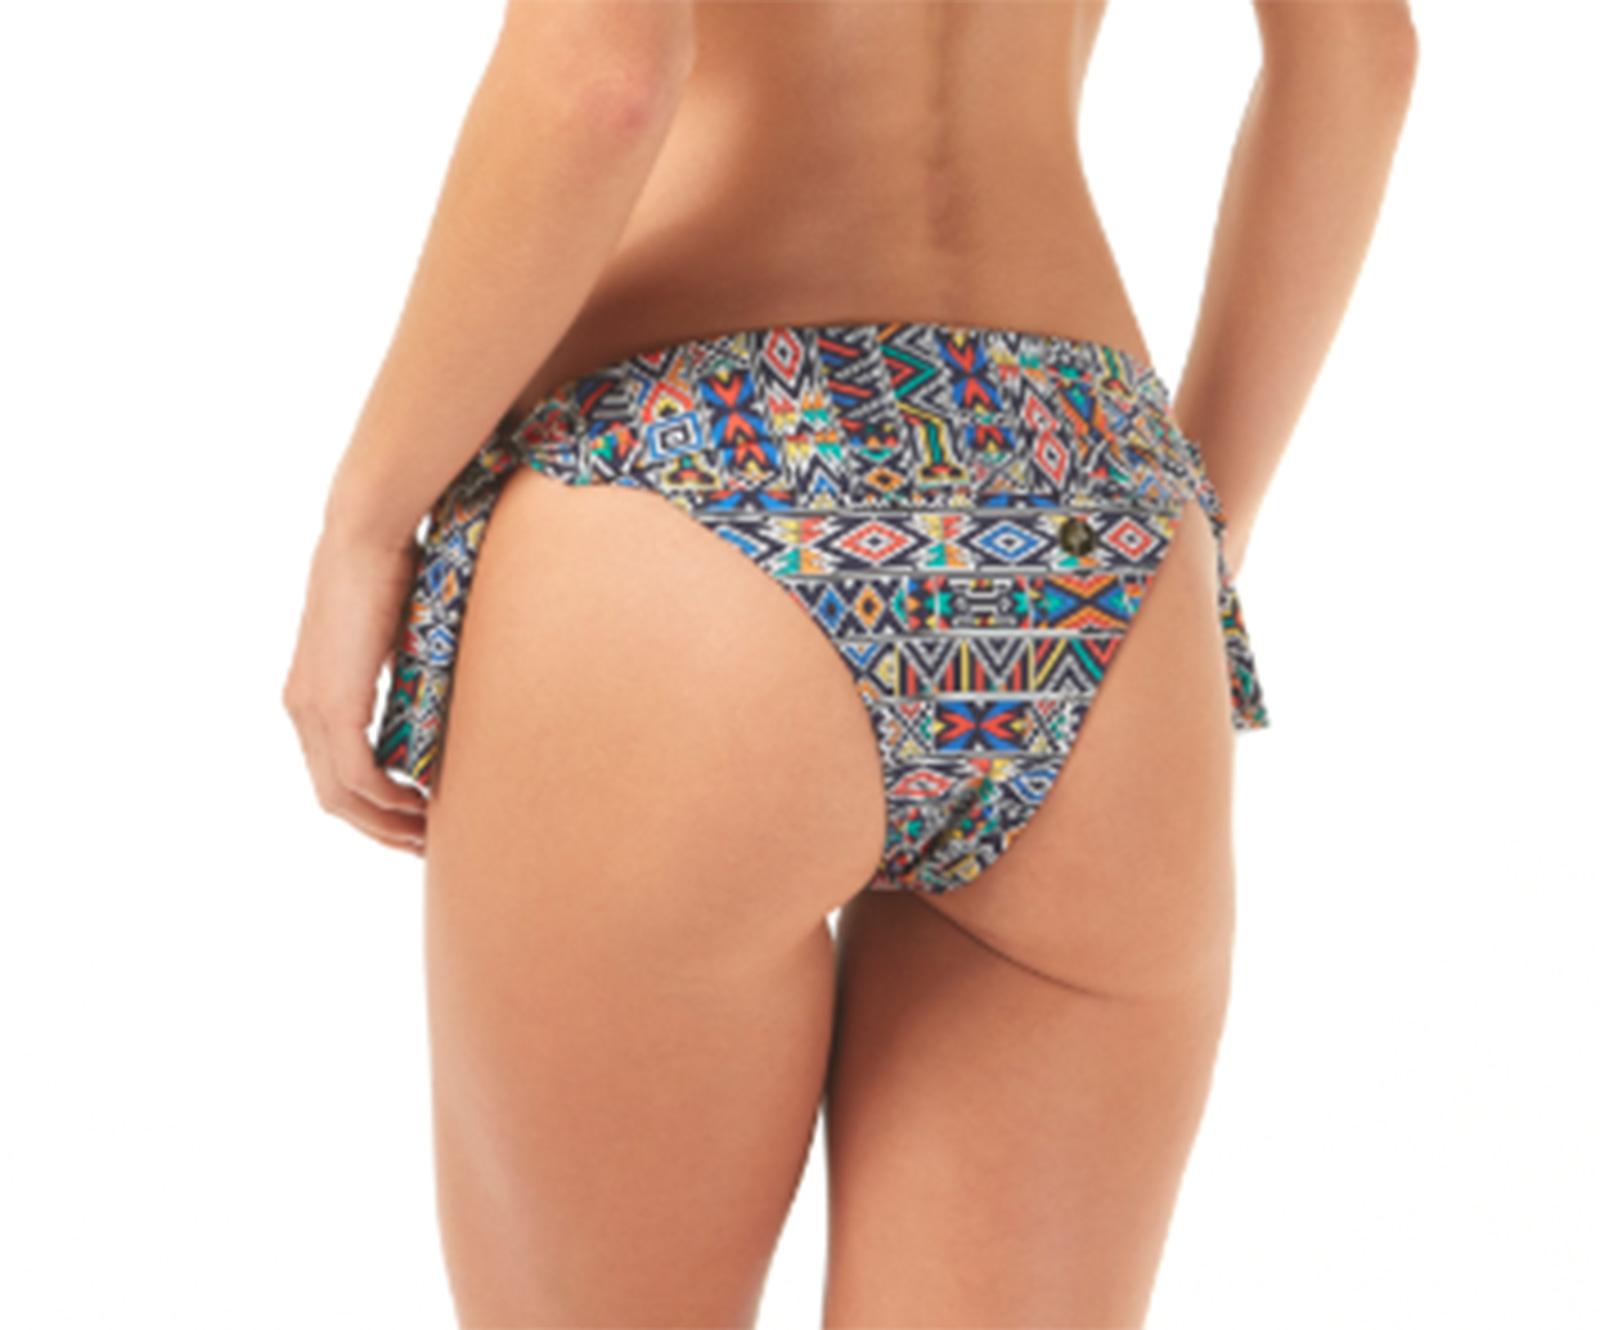 4eb8d712d6 Brazilian Bikini Bottom With Ethnic Print - Calcinha Como Uma Onda ...